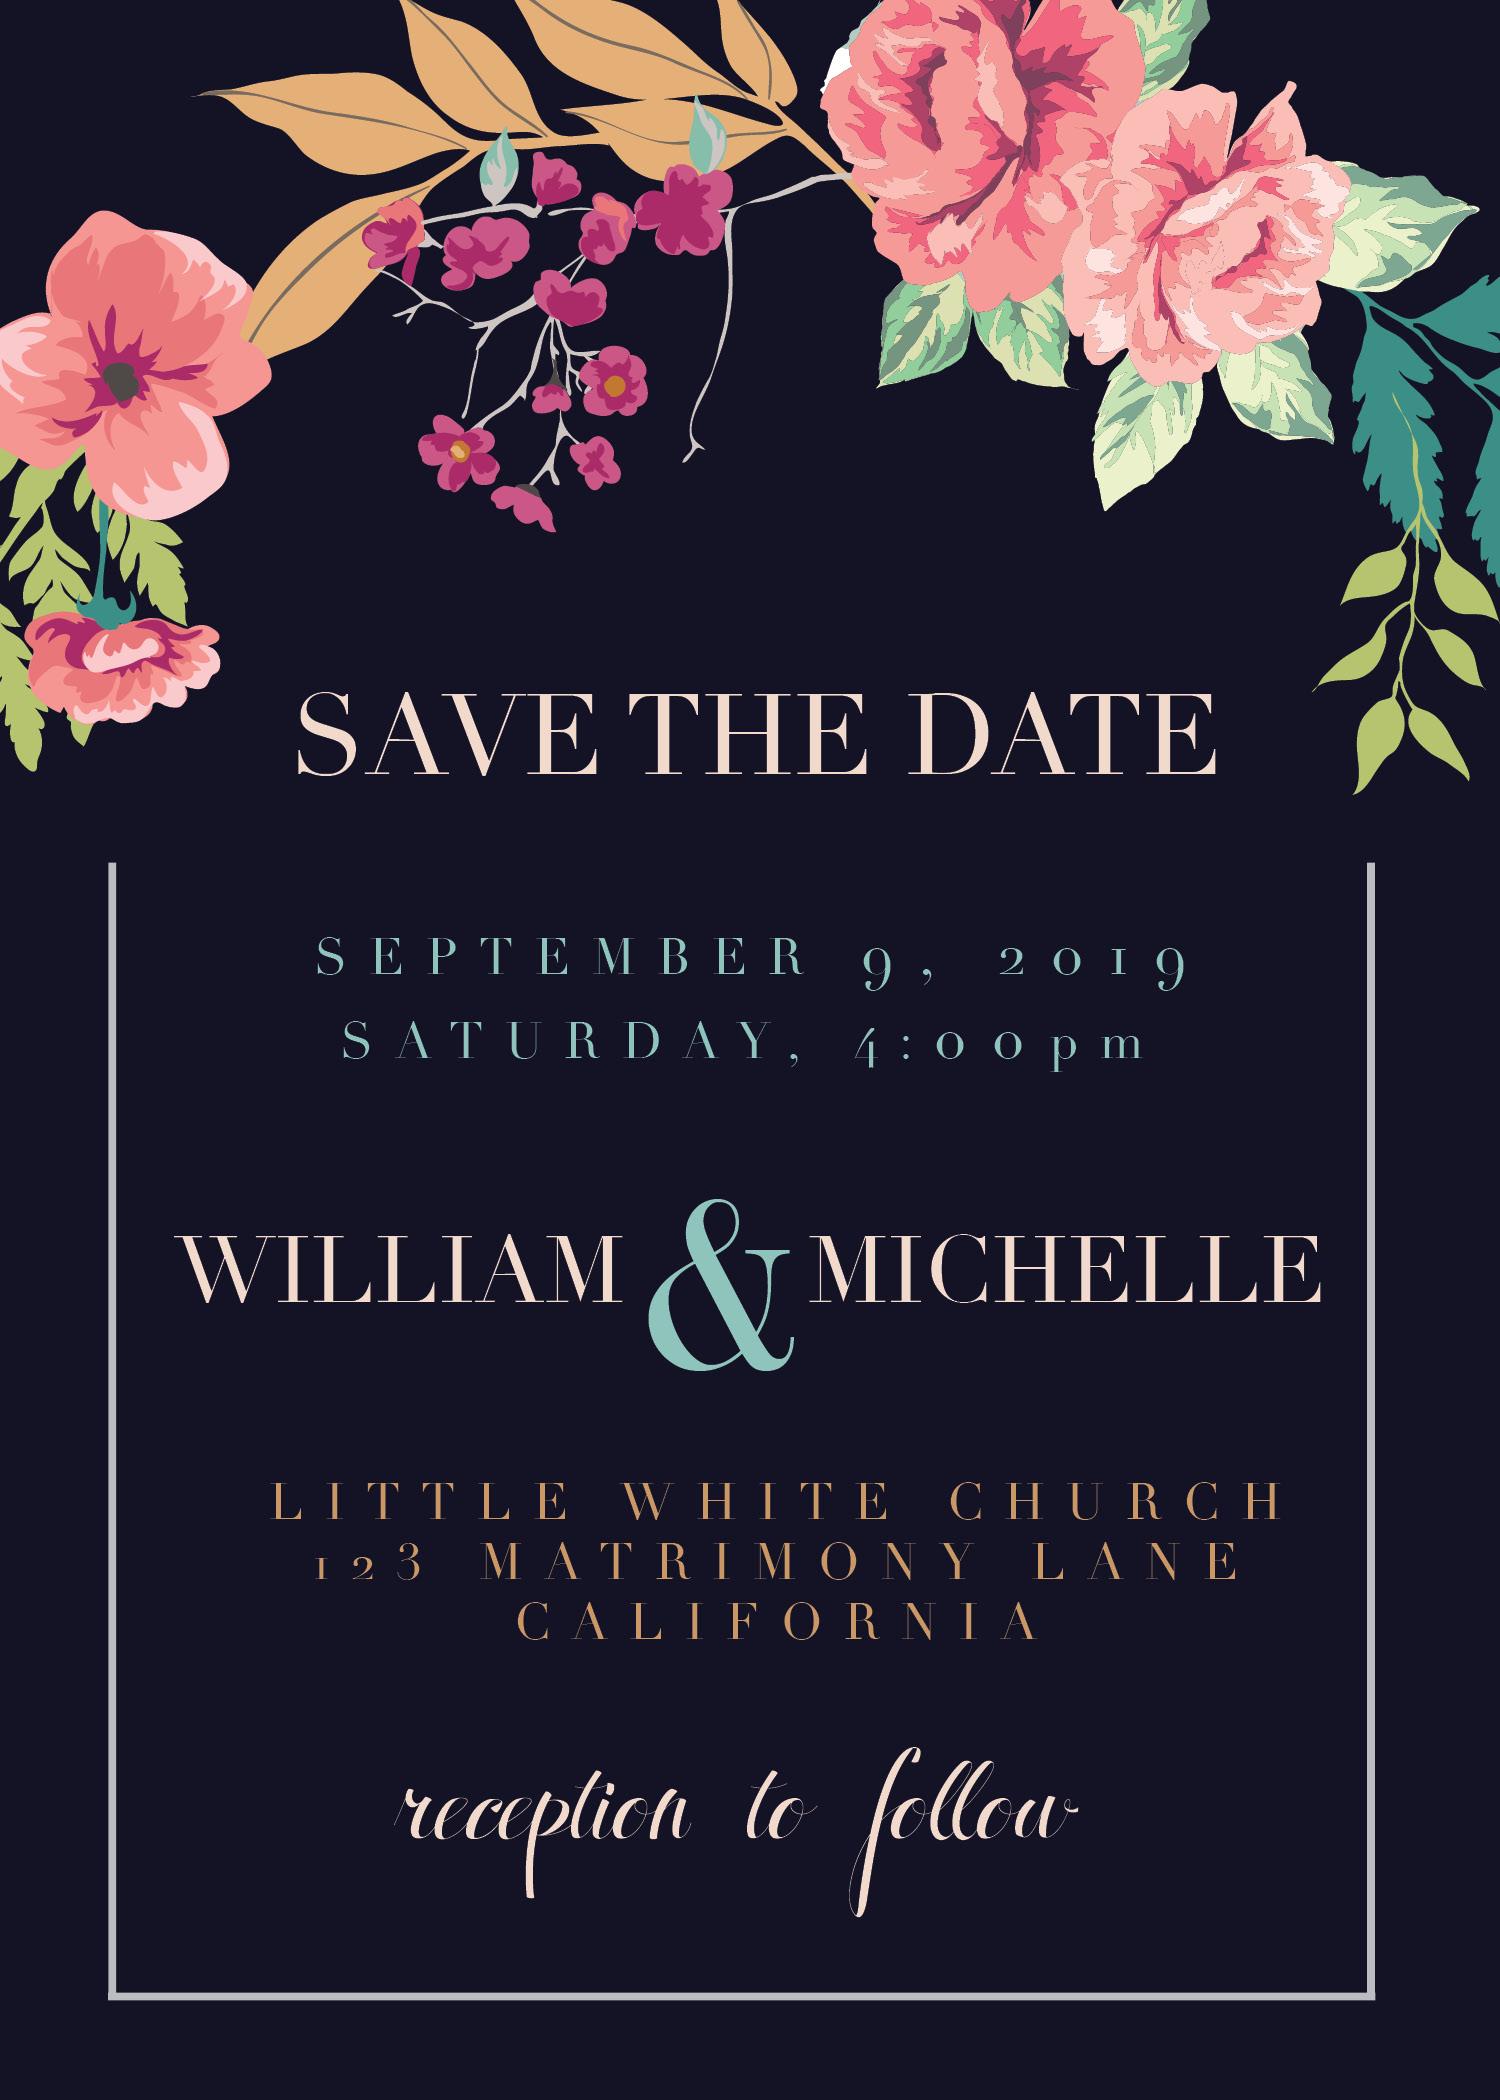 Wedding invite sample 2.jpg